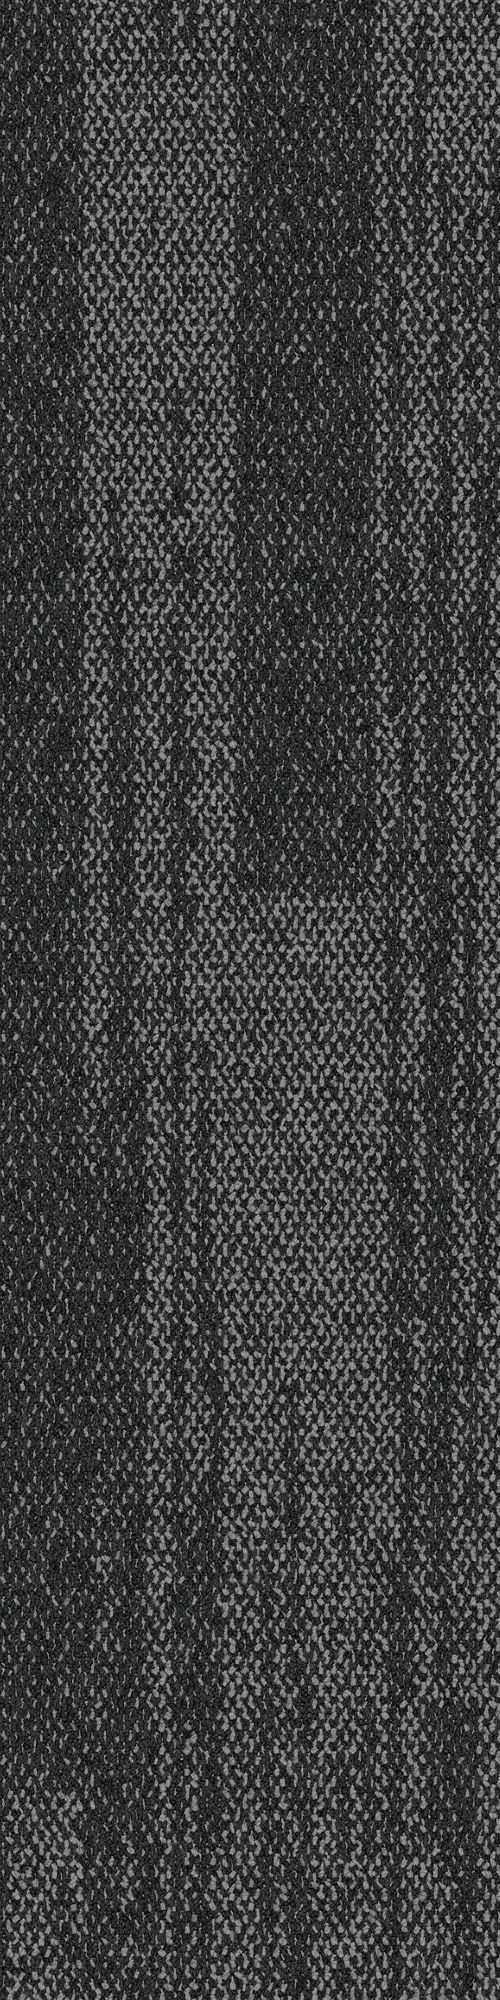 Interface carpet tile: Riverside Color name: Sandbar